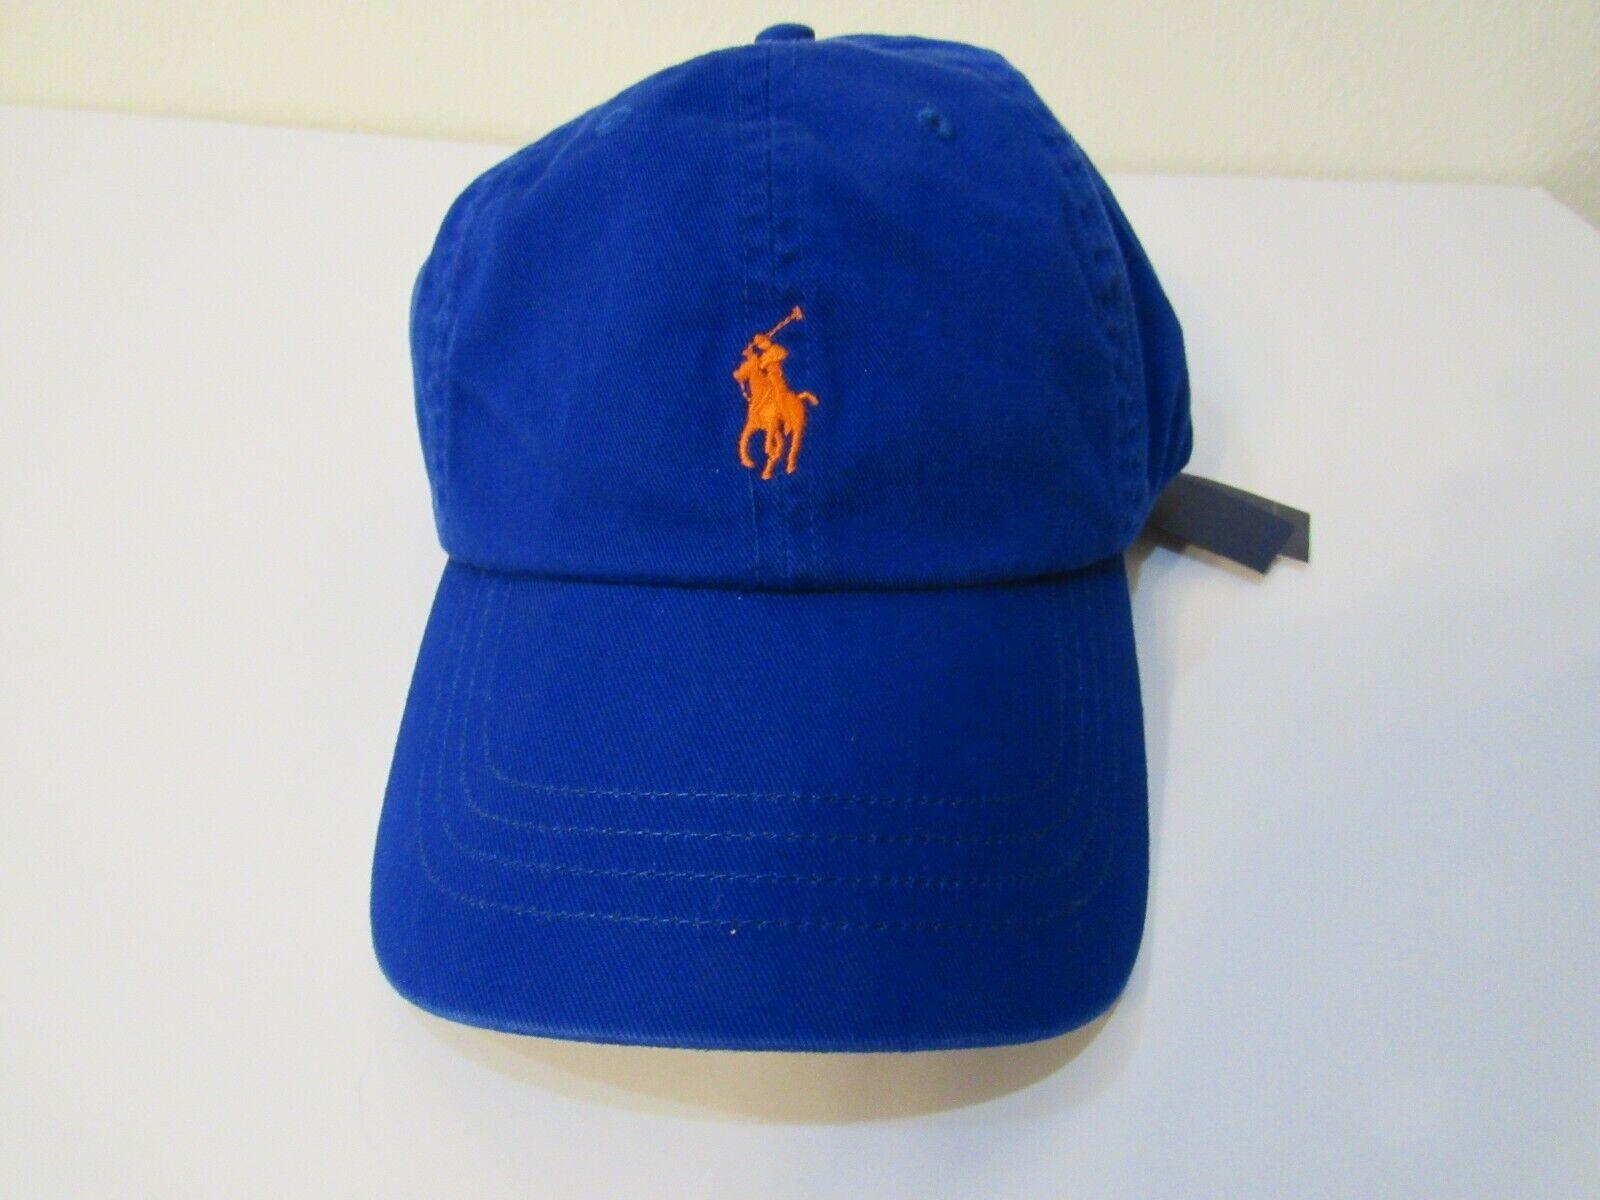 Polo Ralph Lauren Mens Pony Baseball Cap Hat Adjustable Nwt